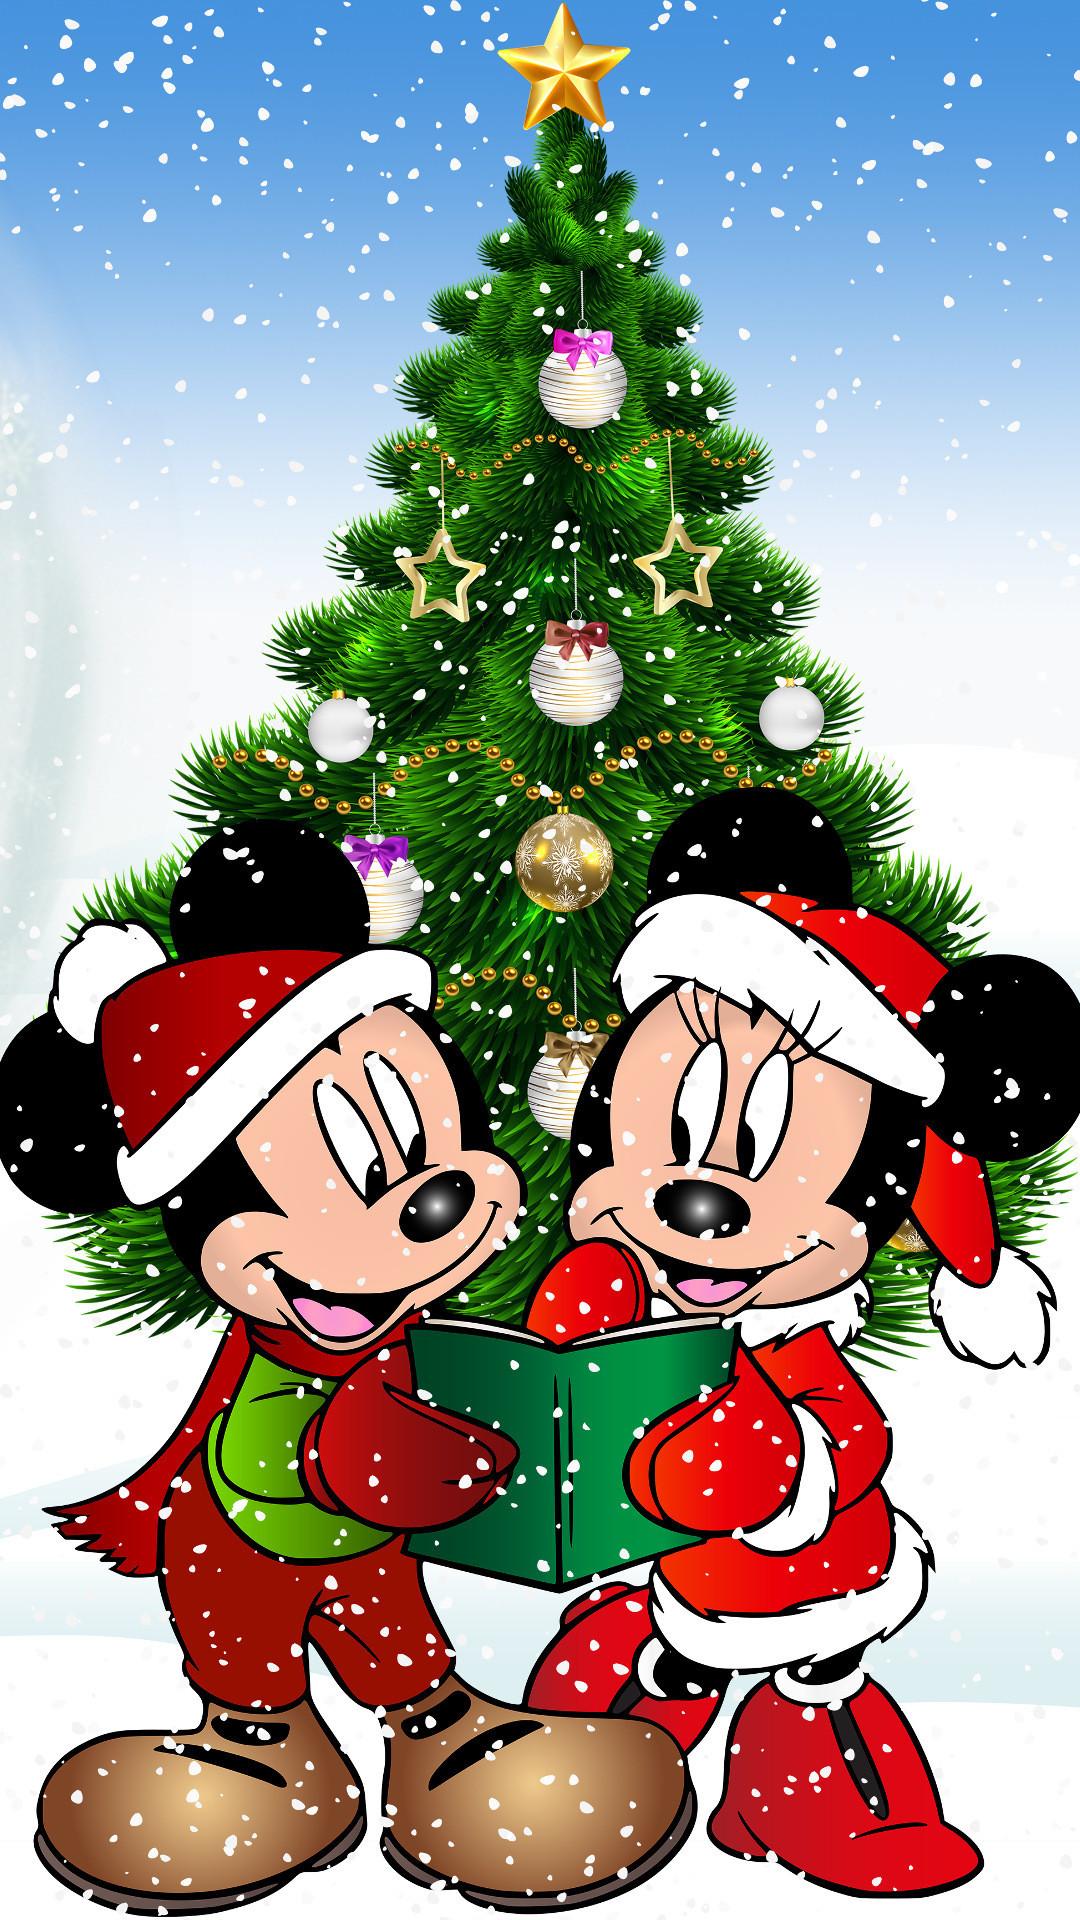 Lockscreen Cute Disney Christmas Iphone Wallpaper - NOSIRIX